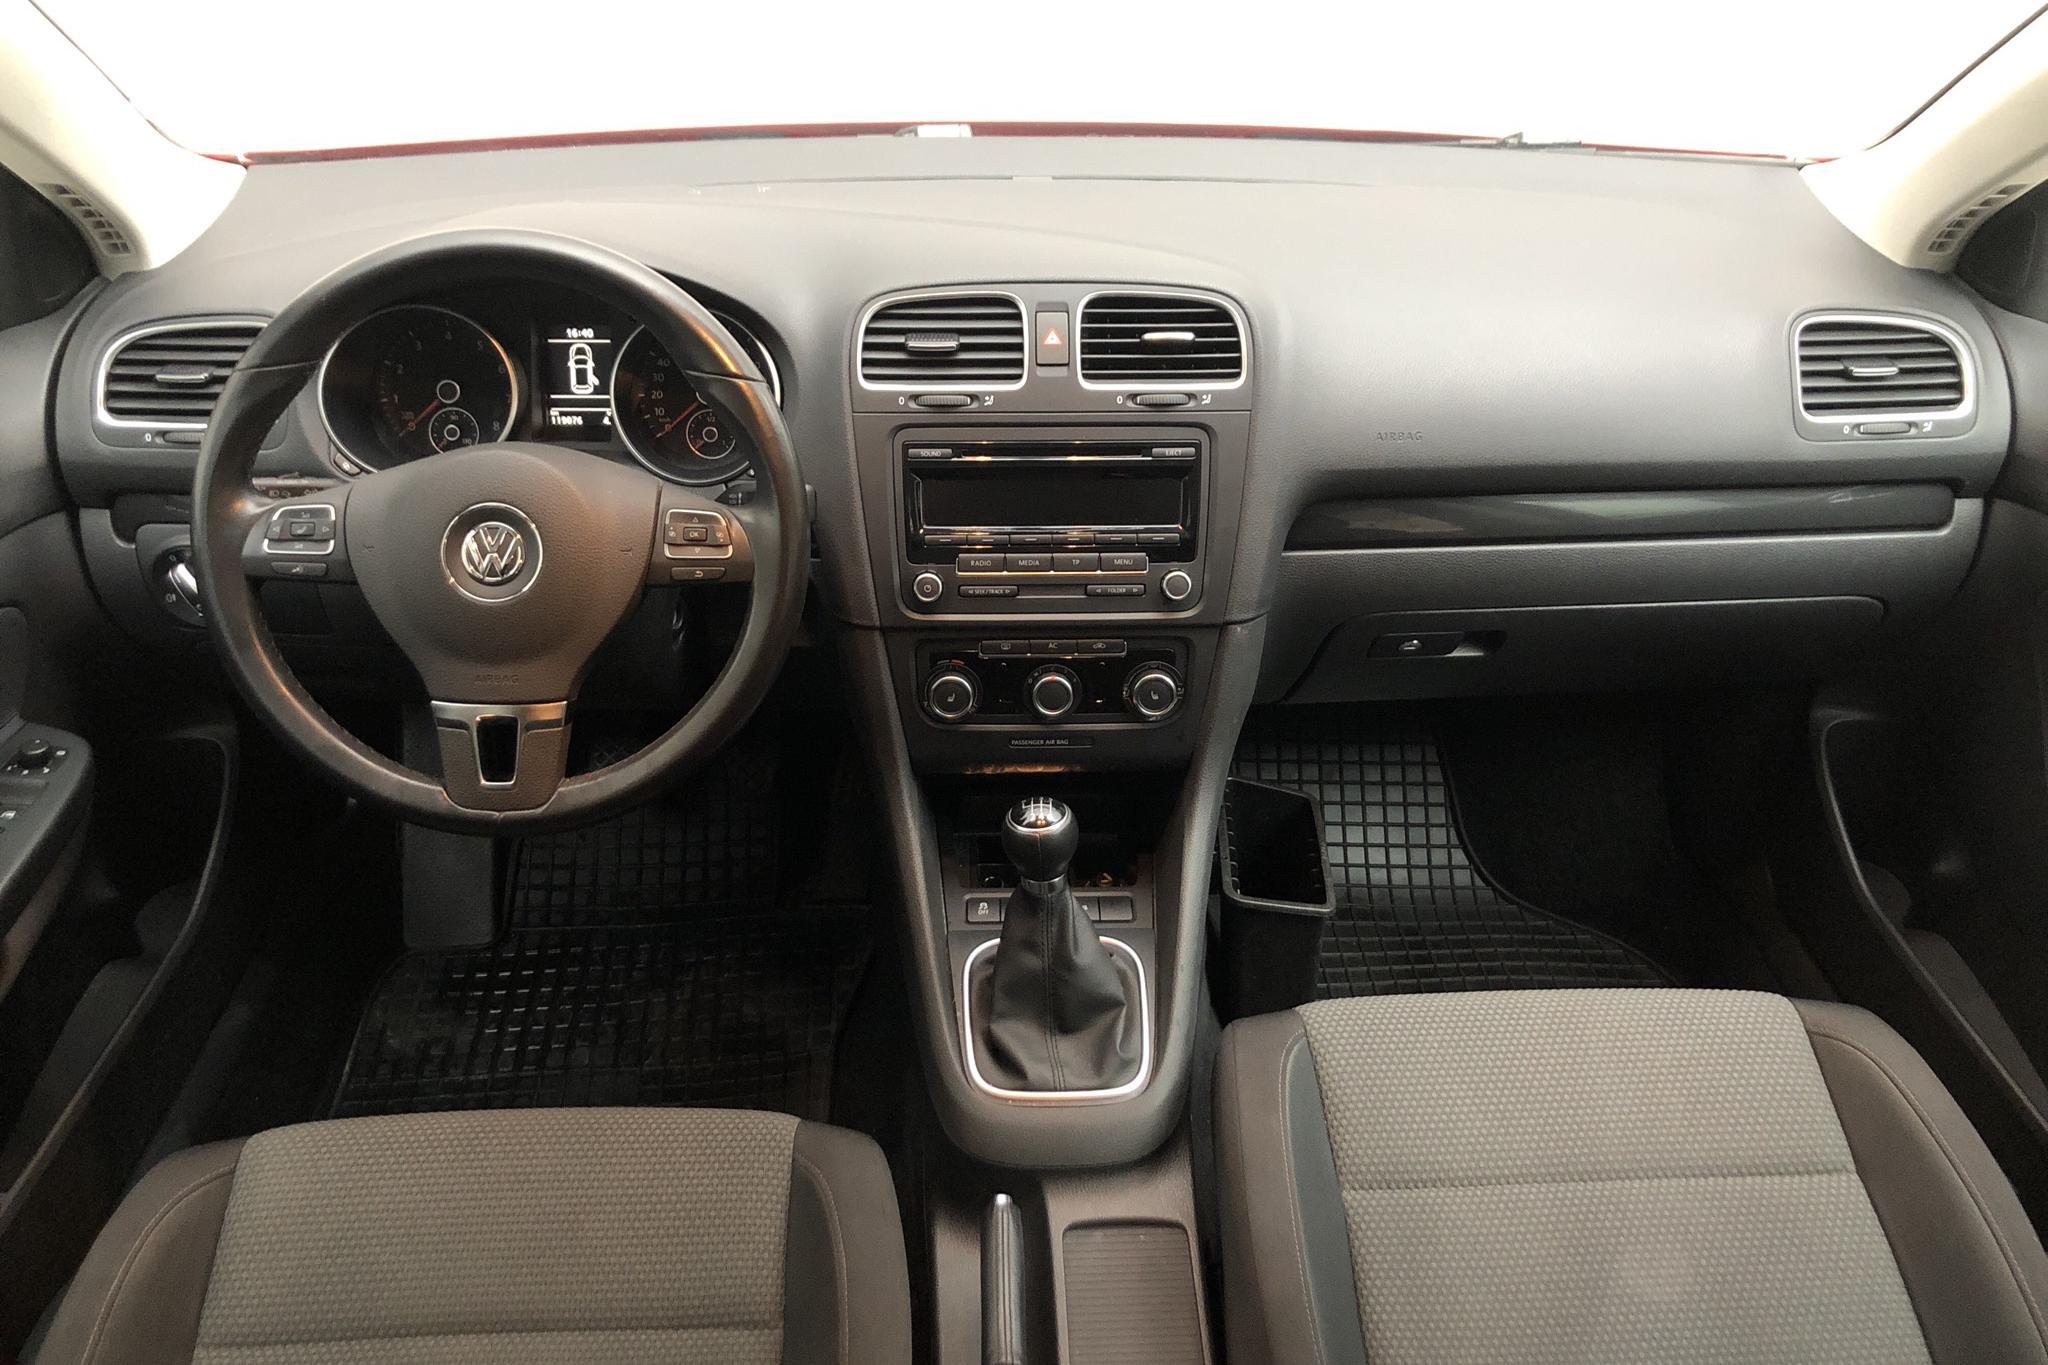 VW Golf VI 1.4 TSI Variant (122hk) - 119 070 km - Manual - red - 2012